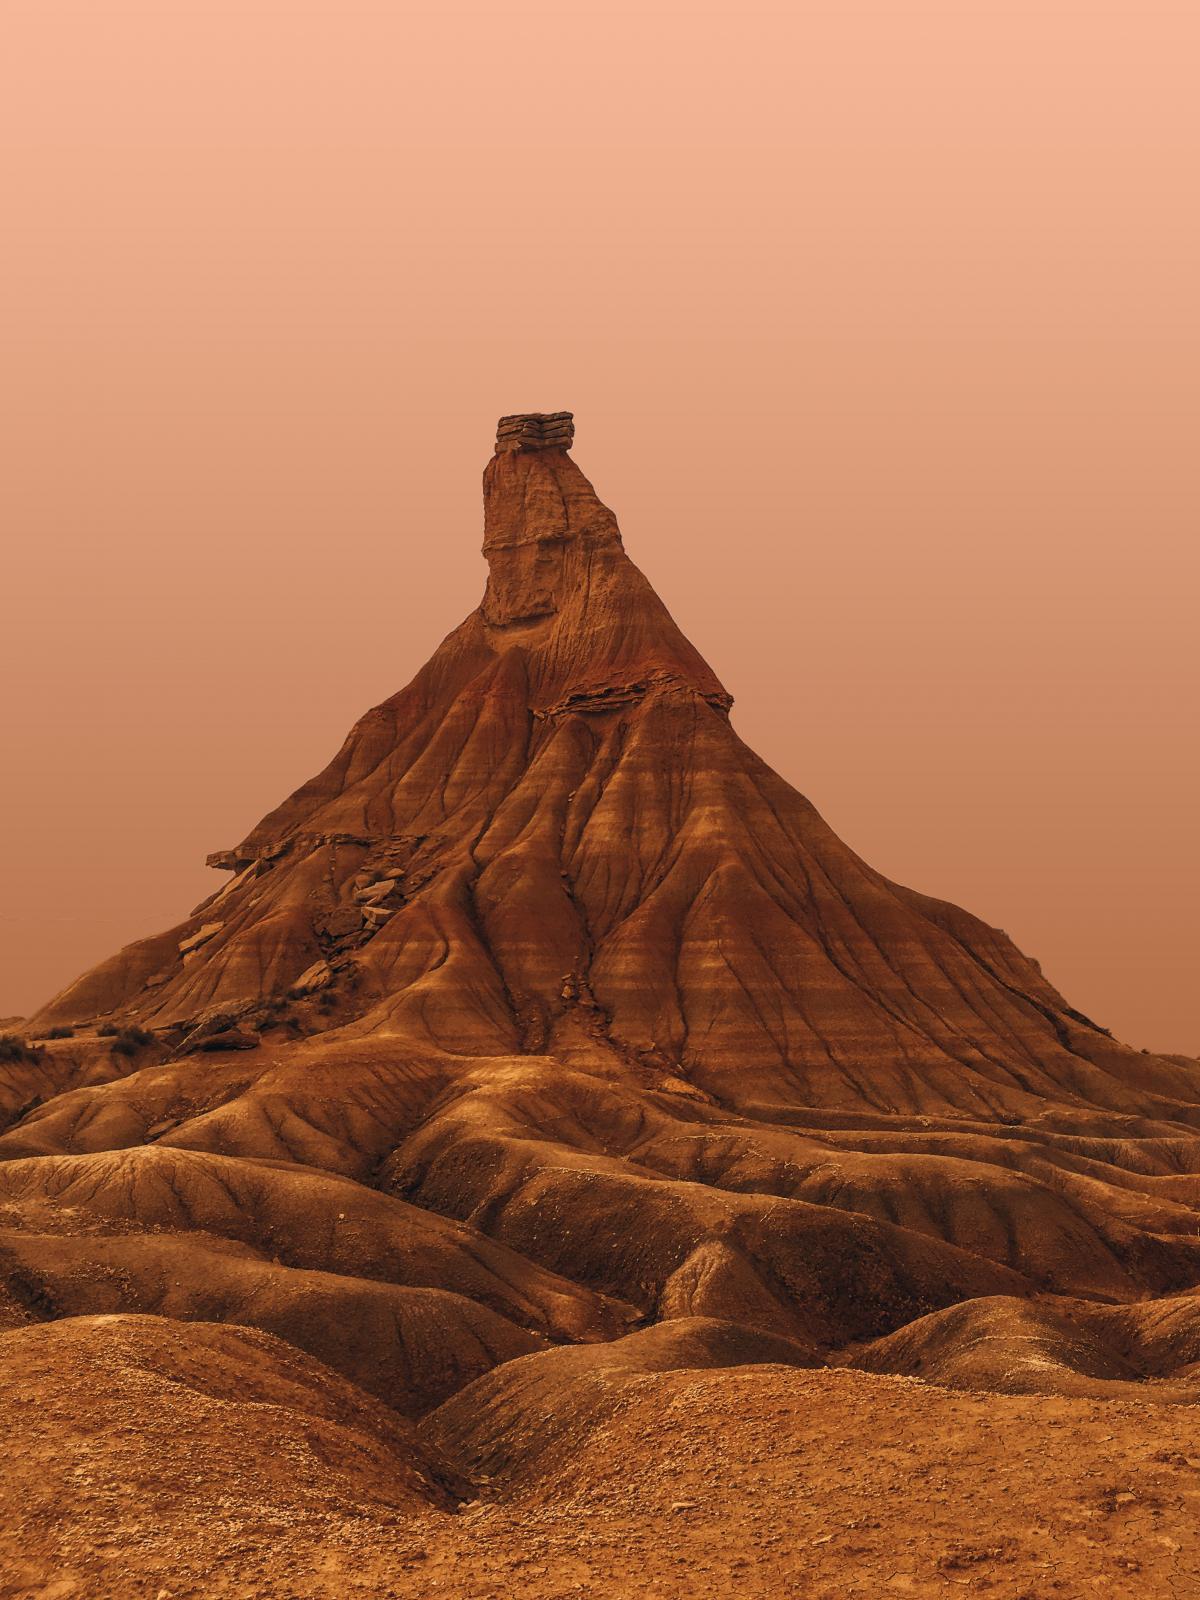 Desert Pyramid Travel #425940